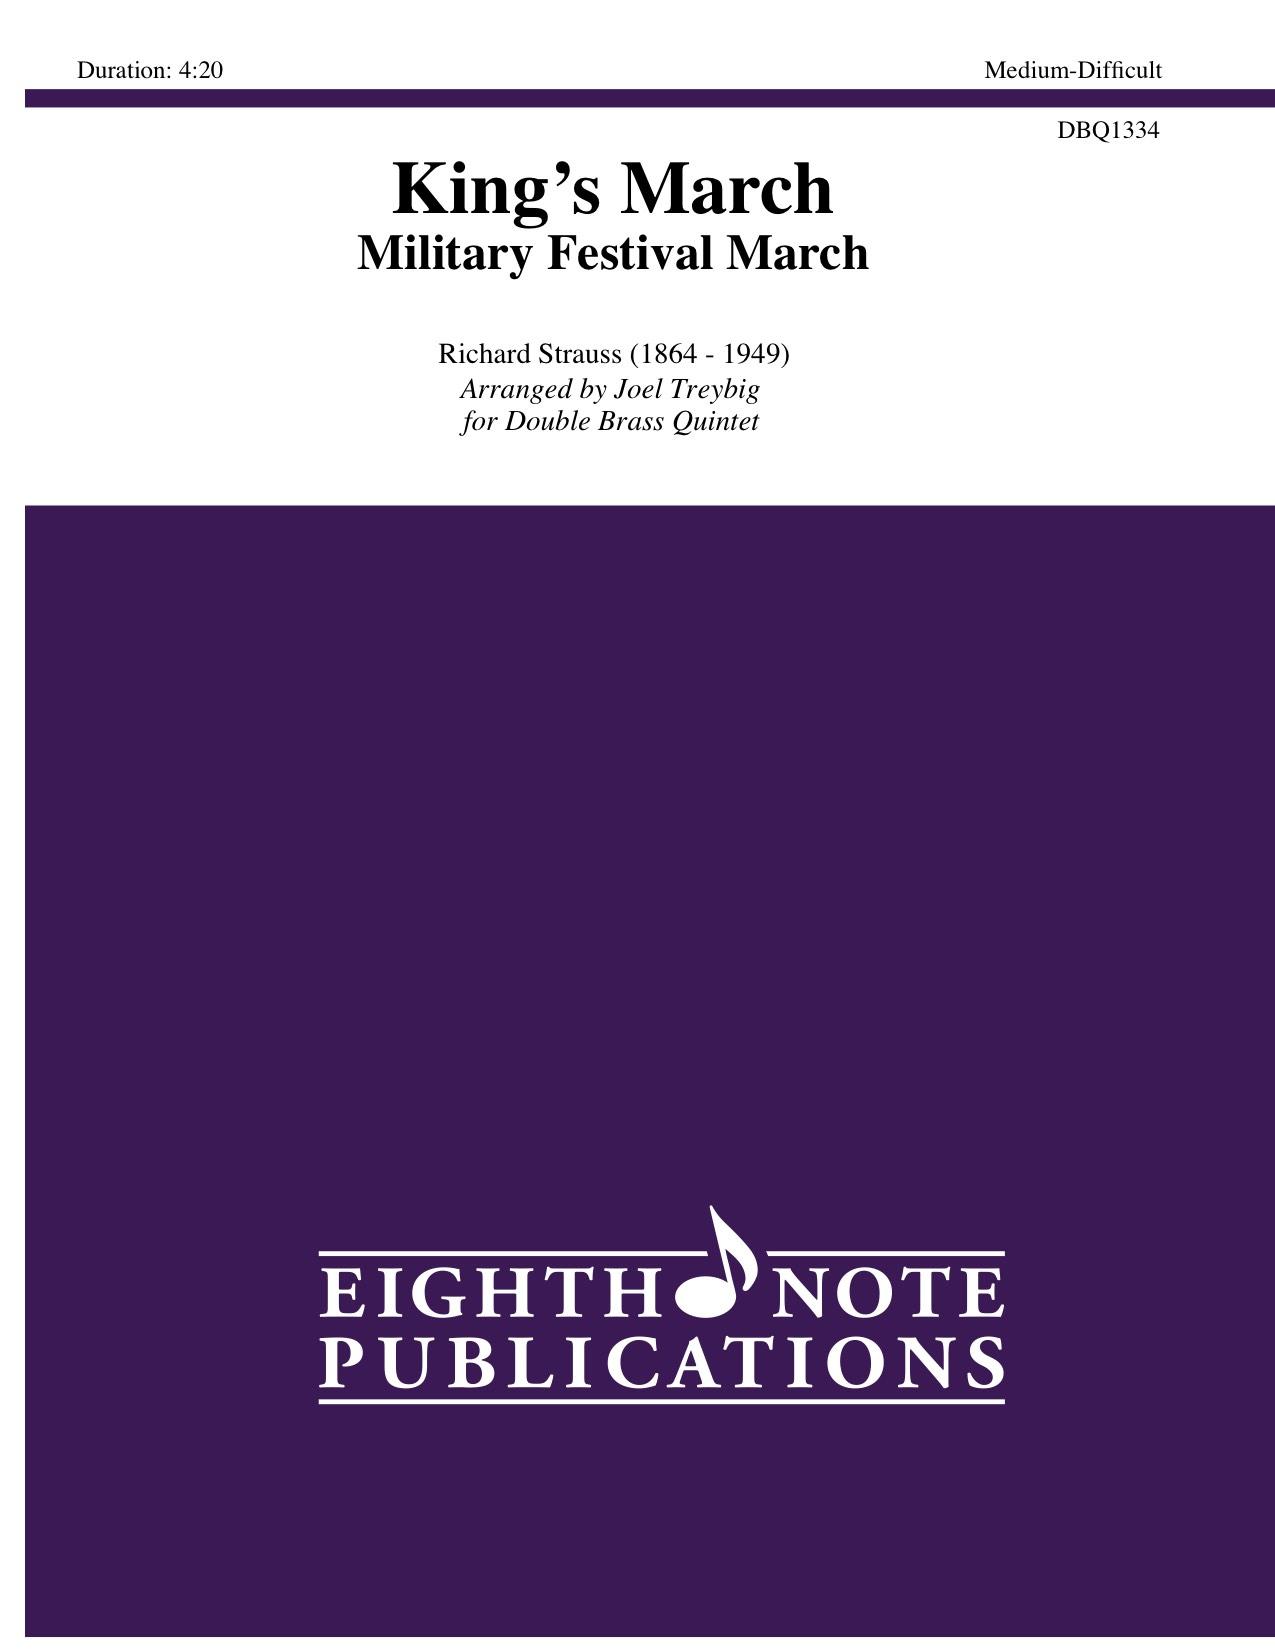 King�s March - Military Festival March - Johann Strauss